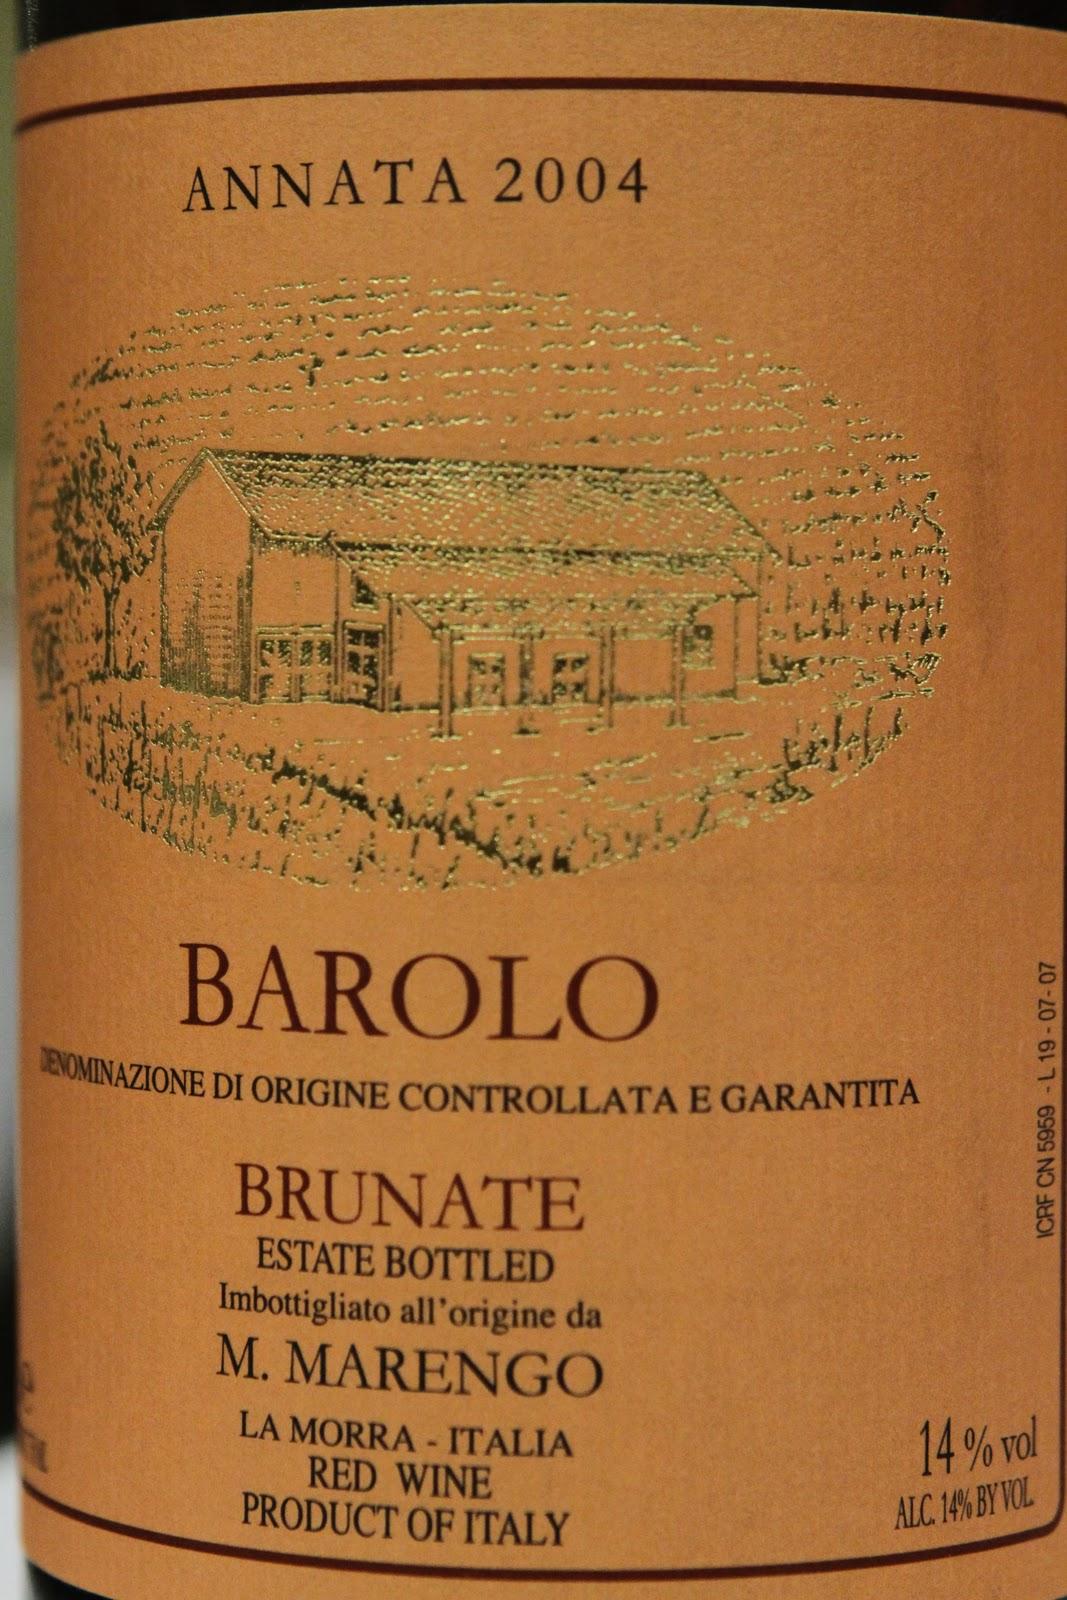 Barolo Brunate 2004 2004 Marengo Barolo Brunate